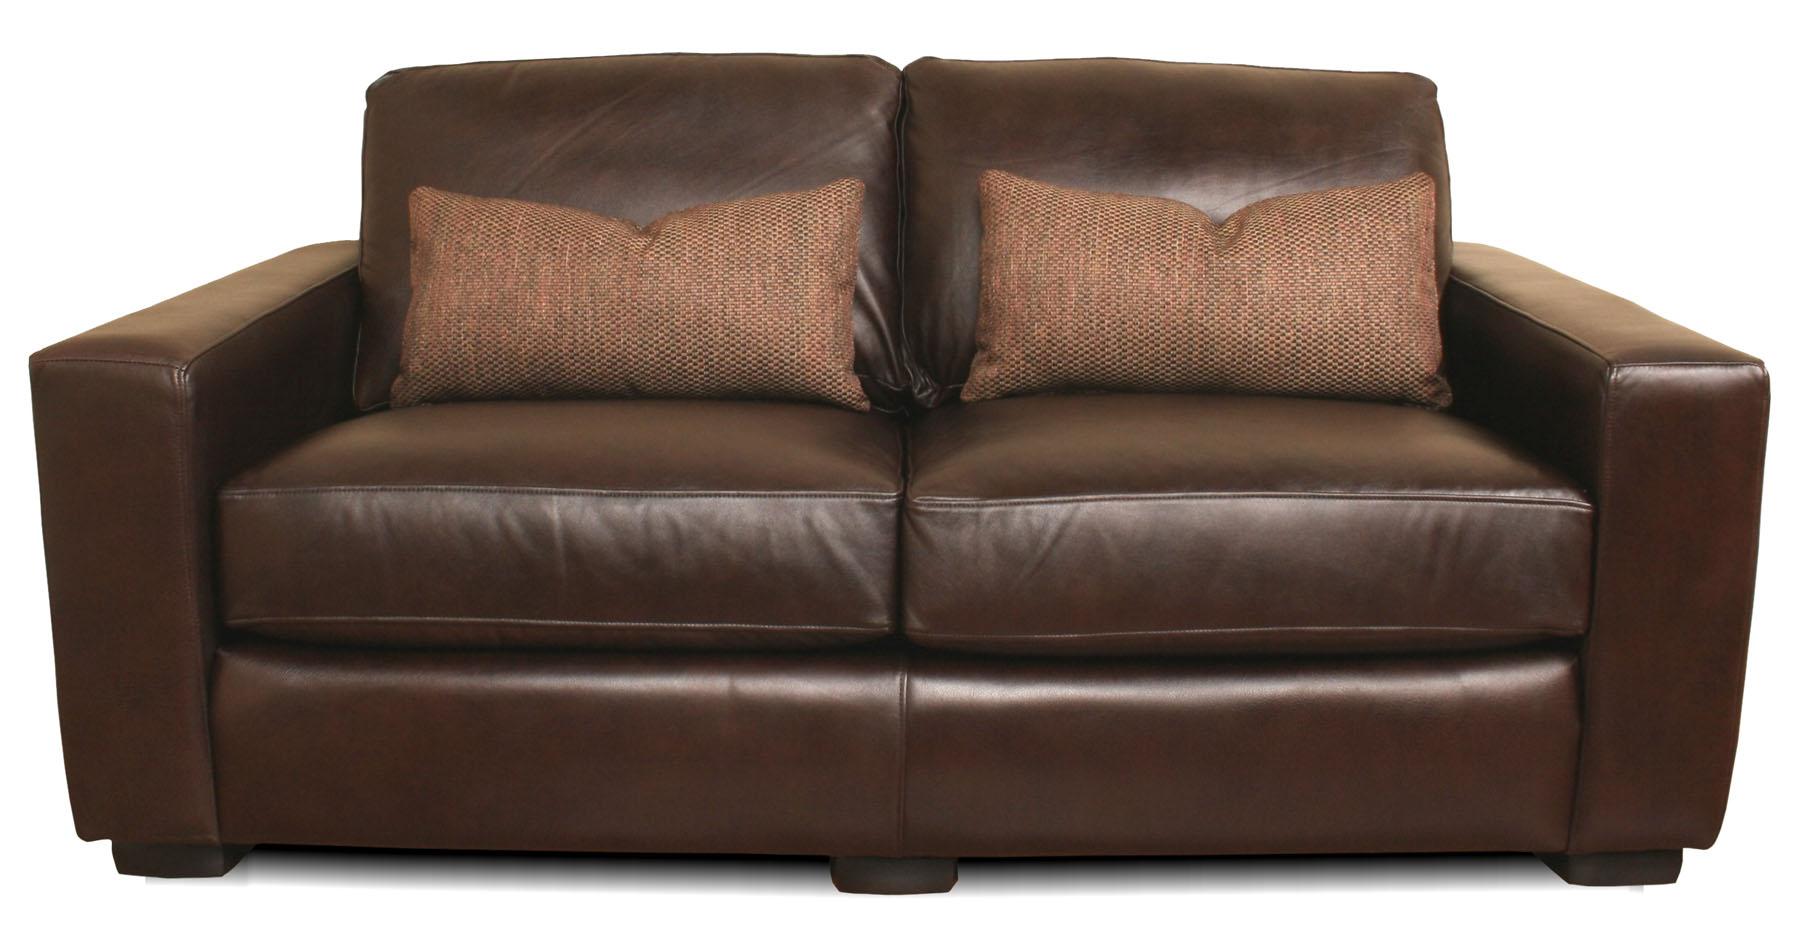 Oakland Deep Leather Furniture